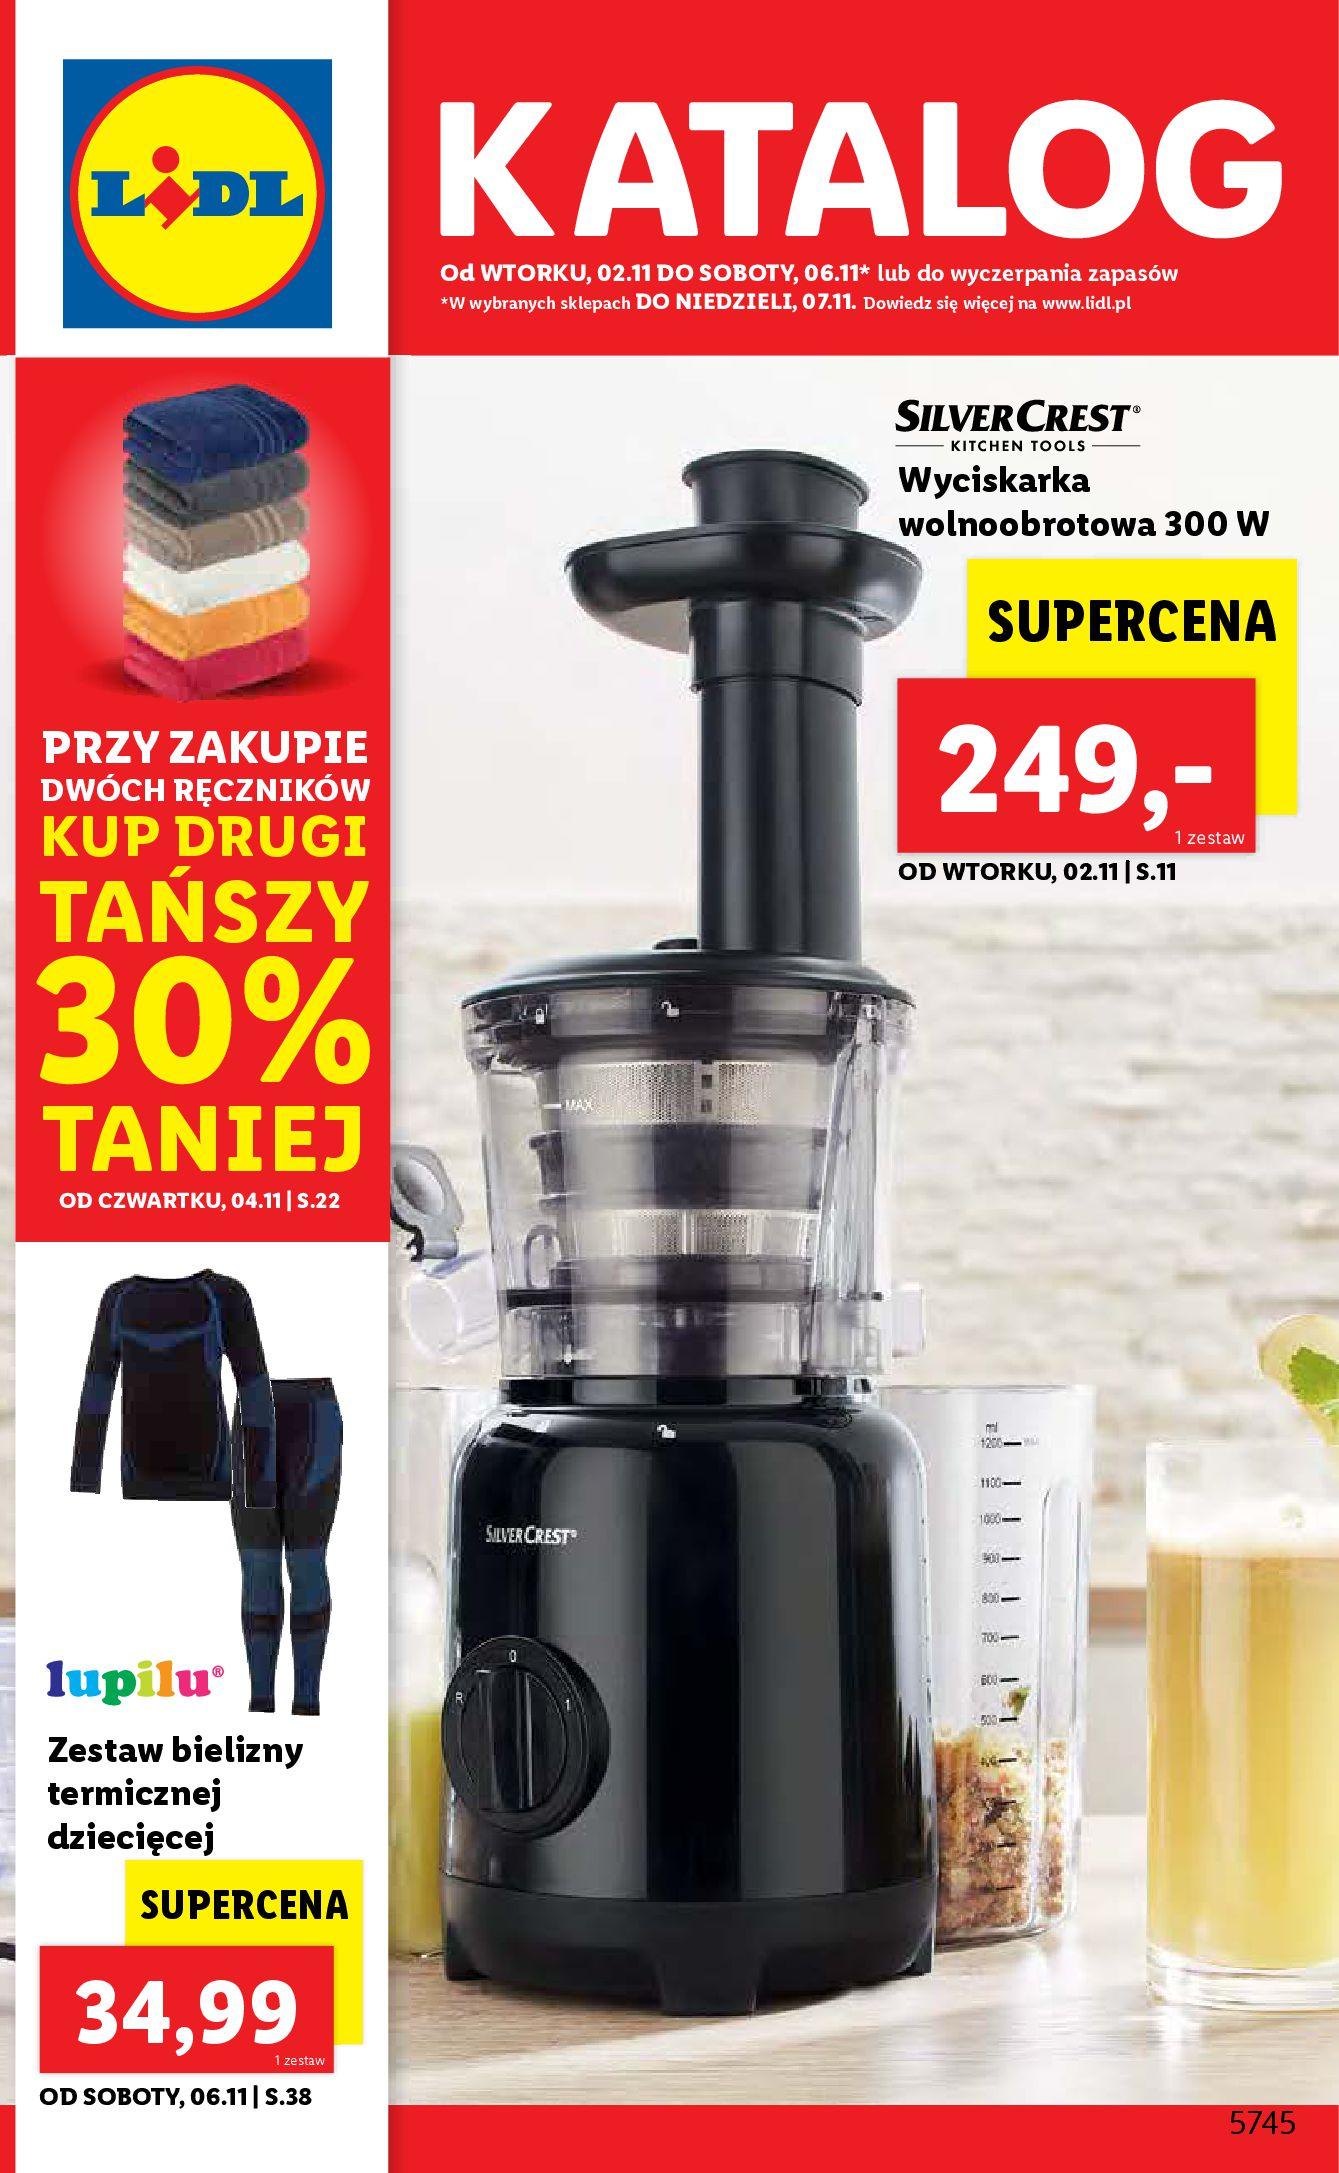 Gazetka Lidl: Gazetka Lidl - katalog od 2.11. - 01.11.2021